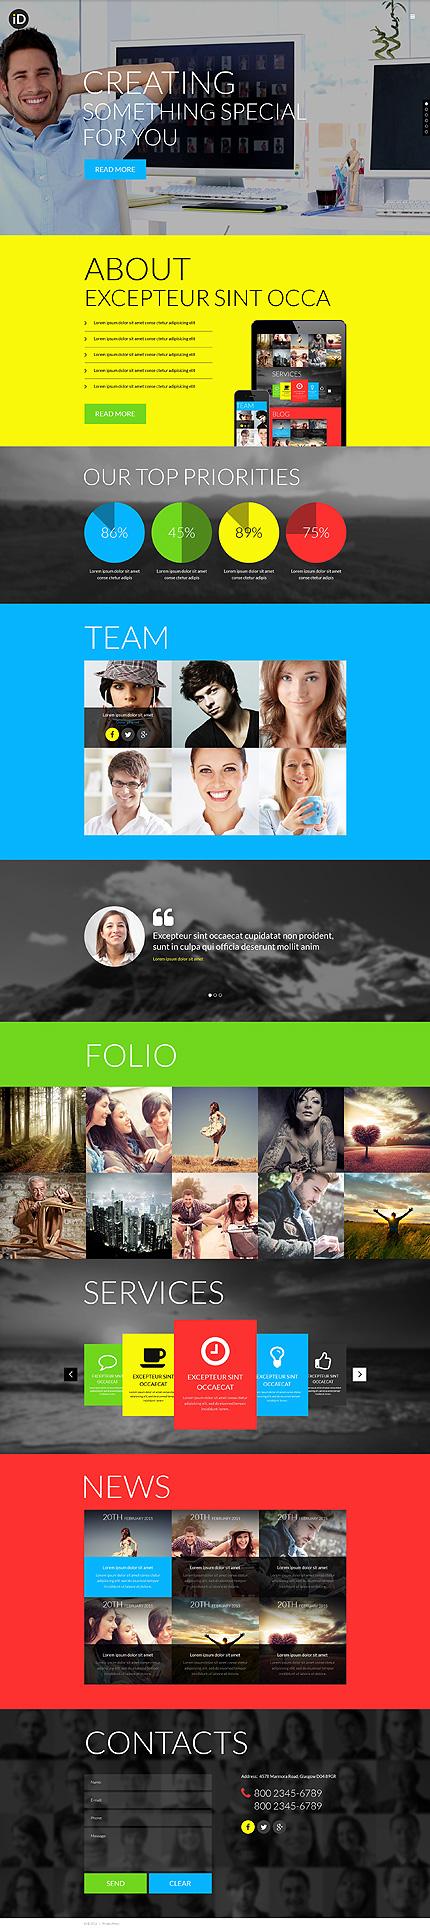 Sablon de | Web design | ID: 674